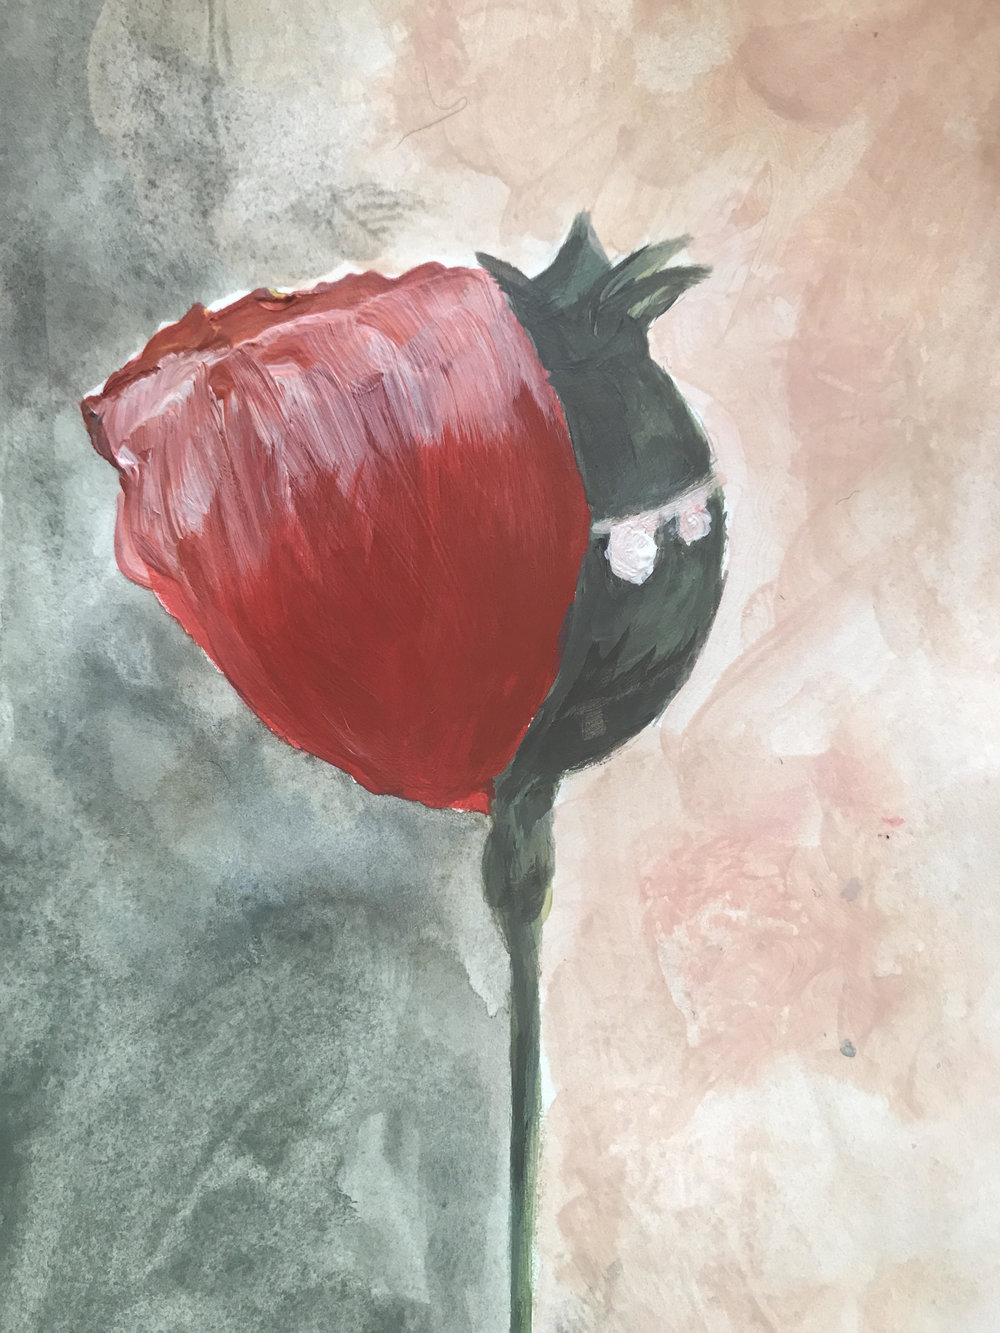 Painting by Tara Aghdashloo